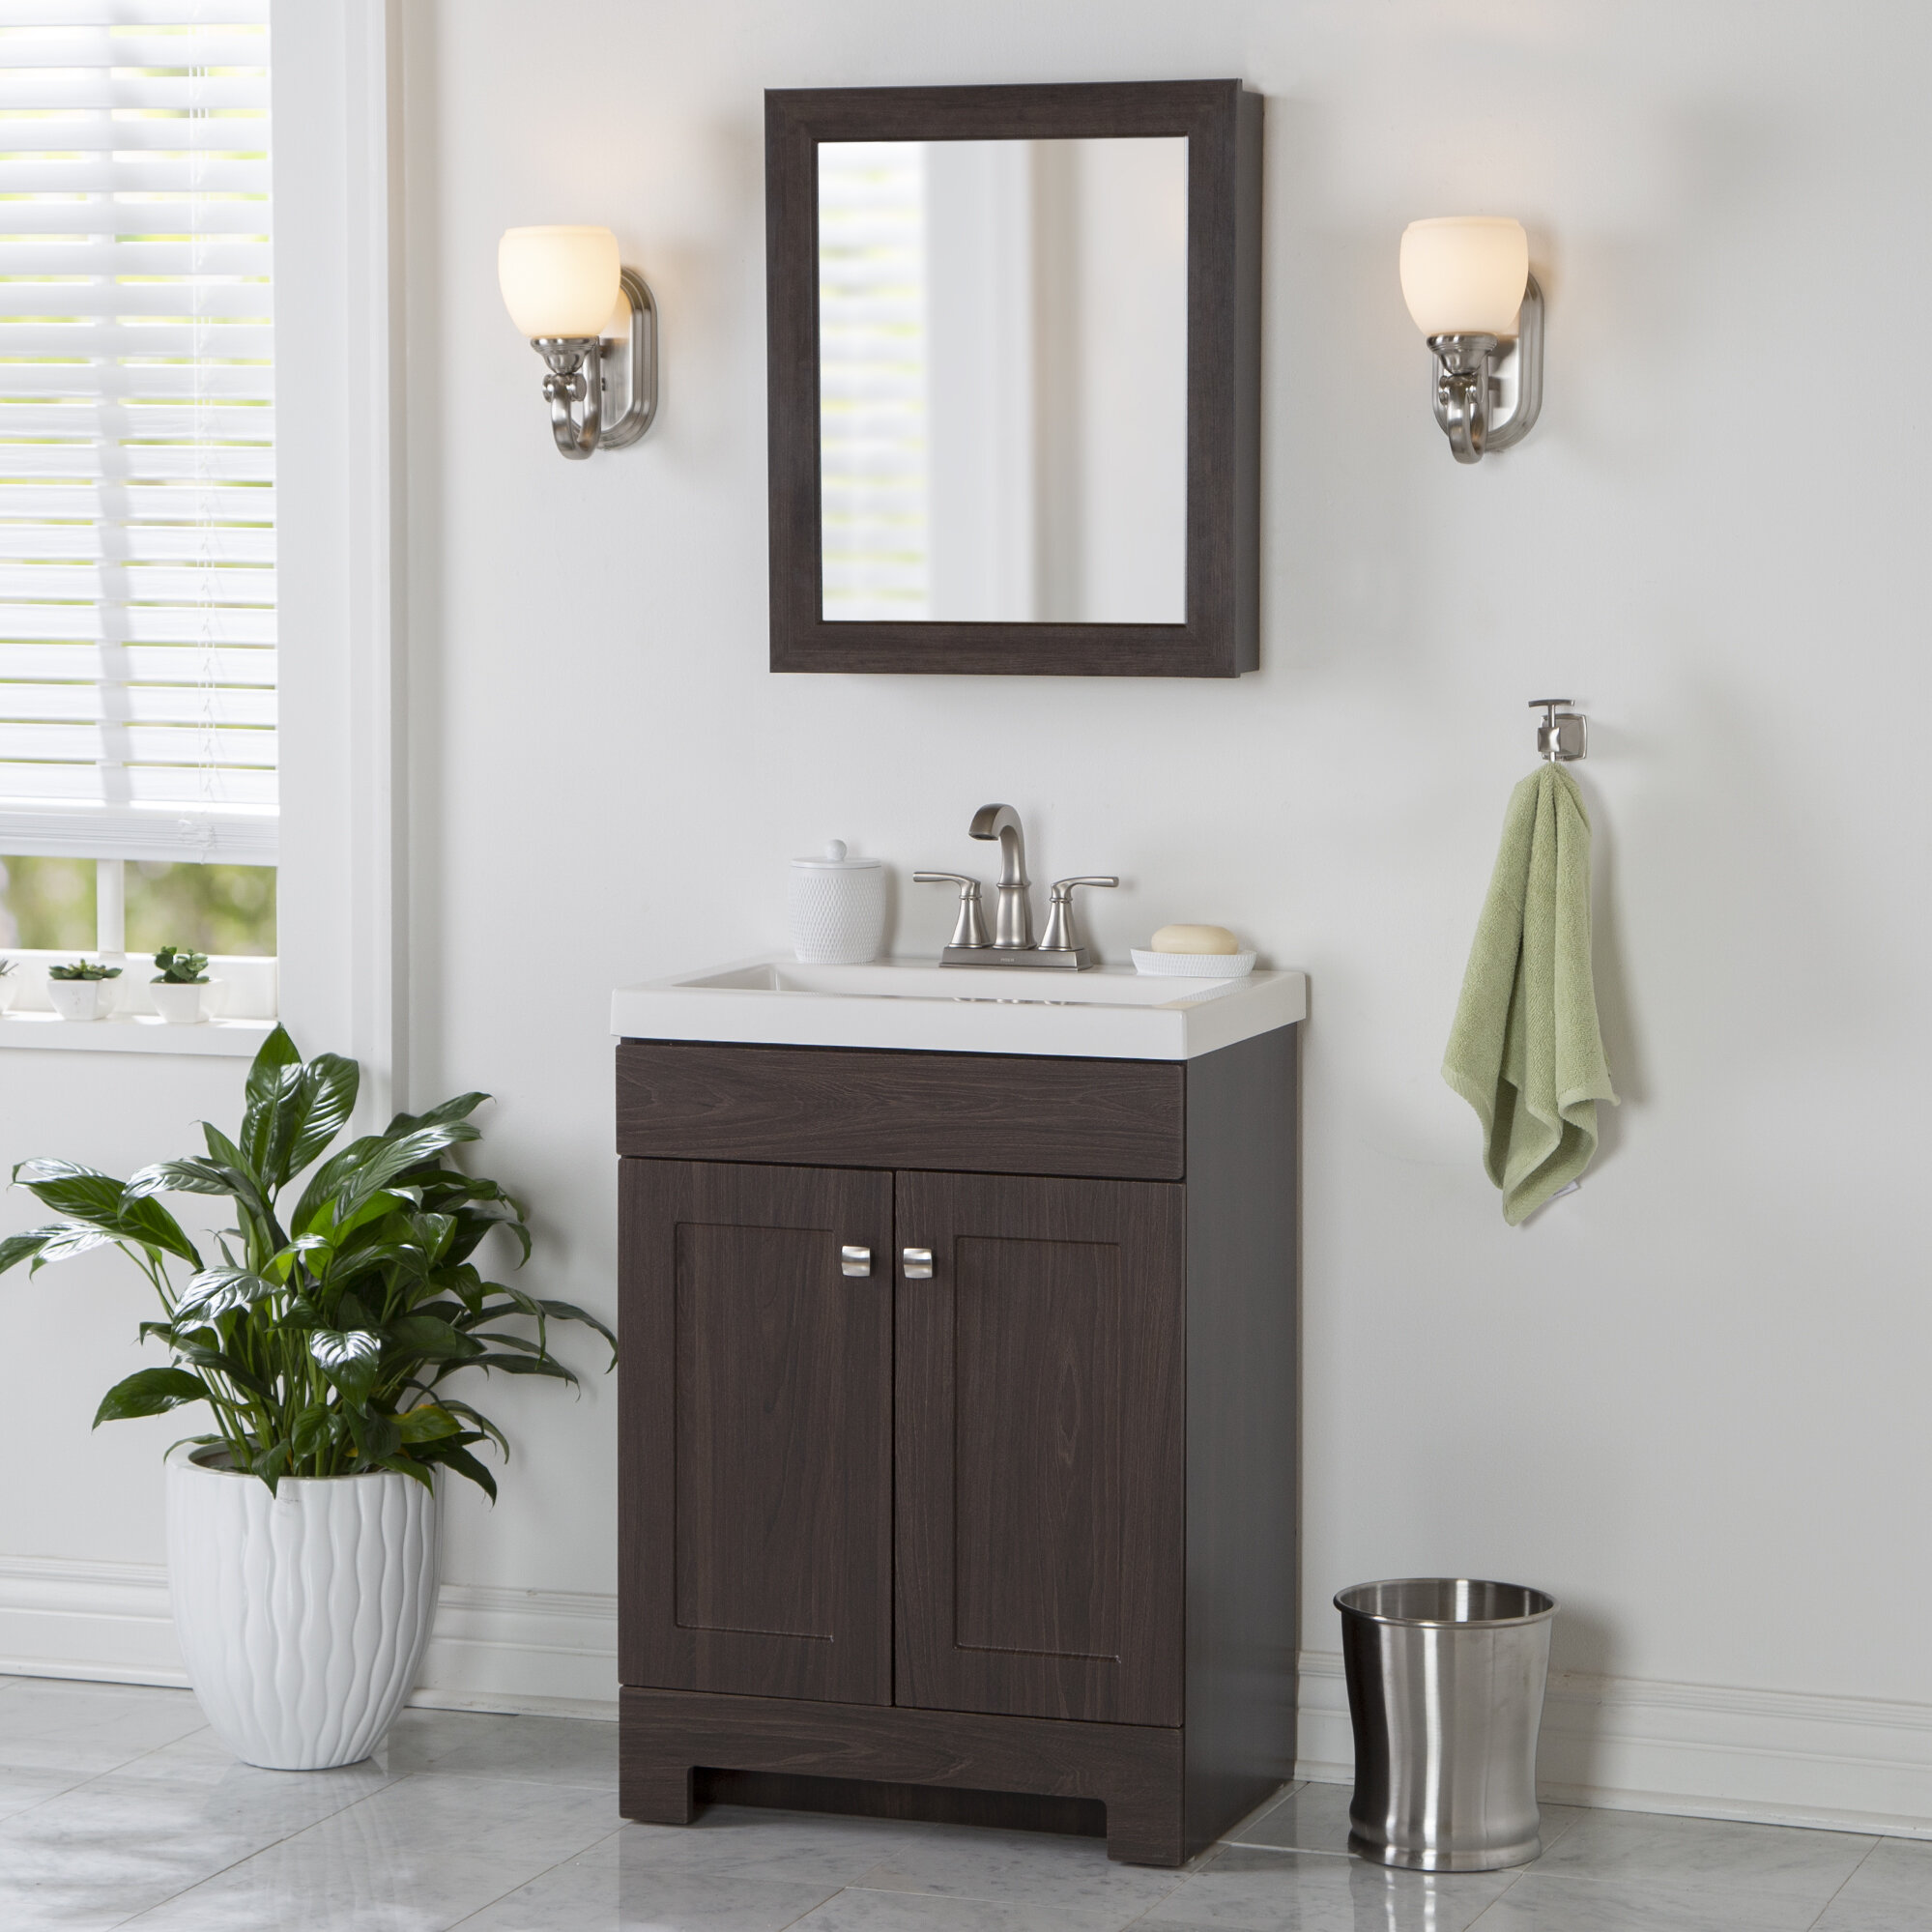 Poche 25 Single Bathroom Vanity Set